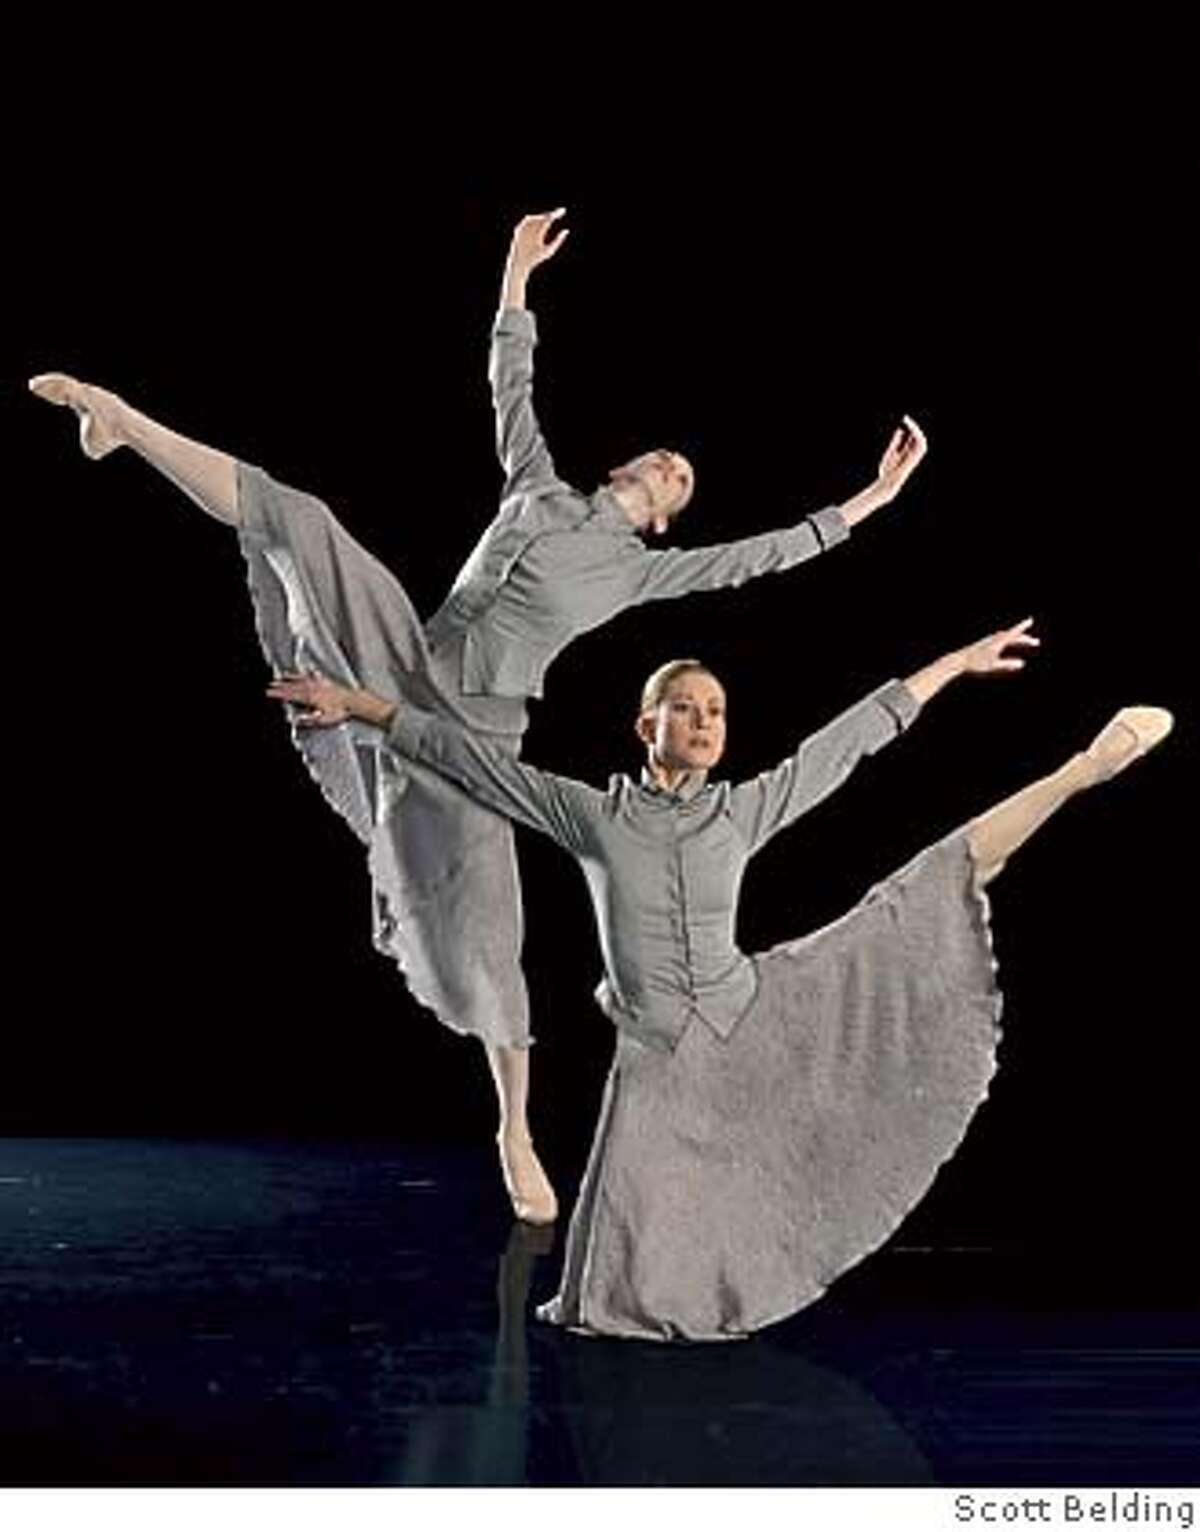 Moving Arts Dance members Holly Morrow and Amanda McGovern in Viktor Kabaniaev's Largo. Photo: Courtesy of Scott Belding